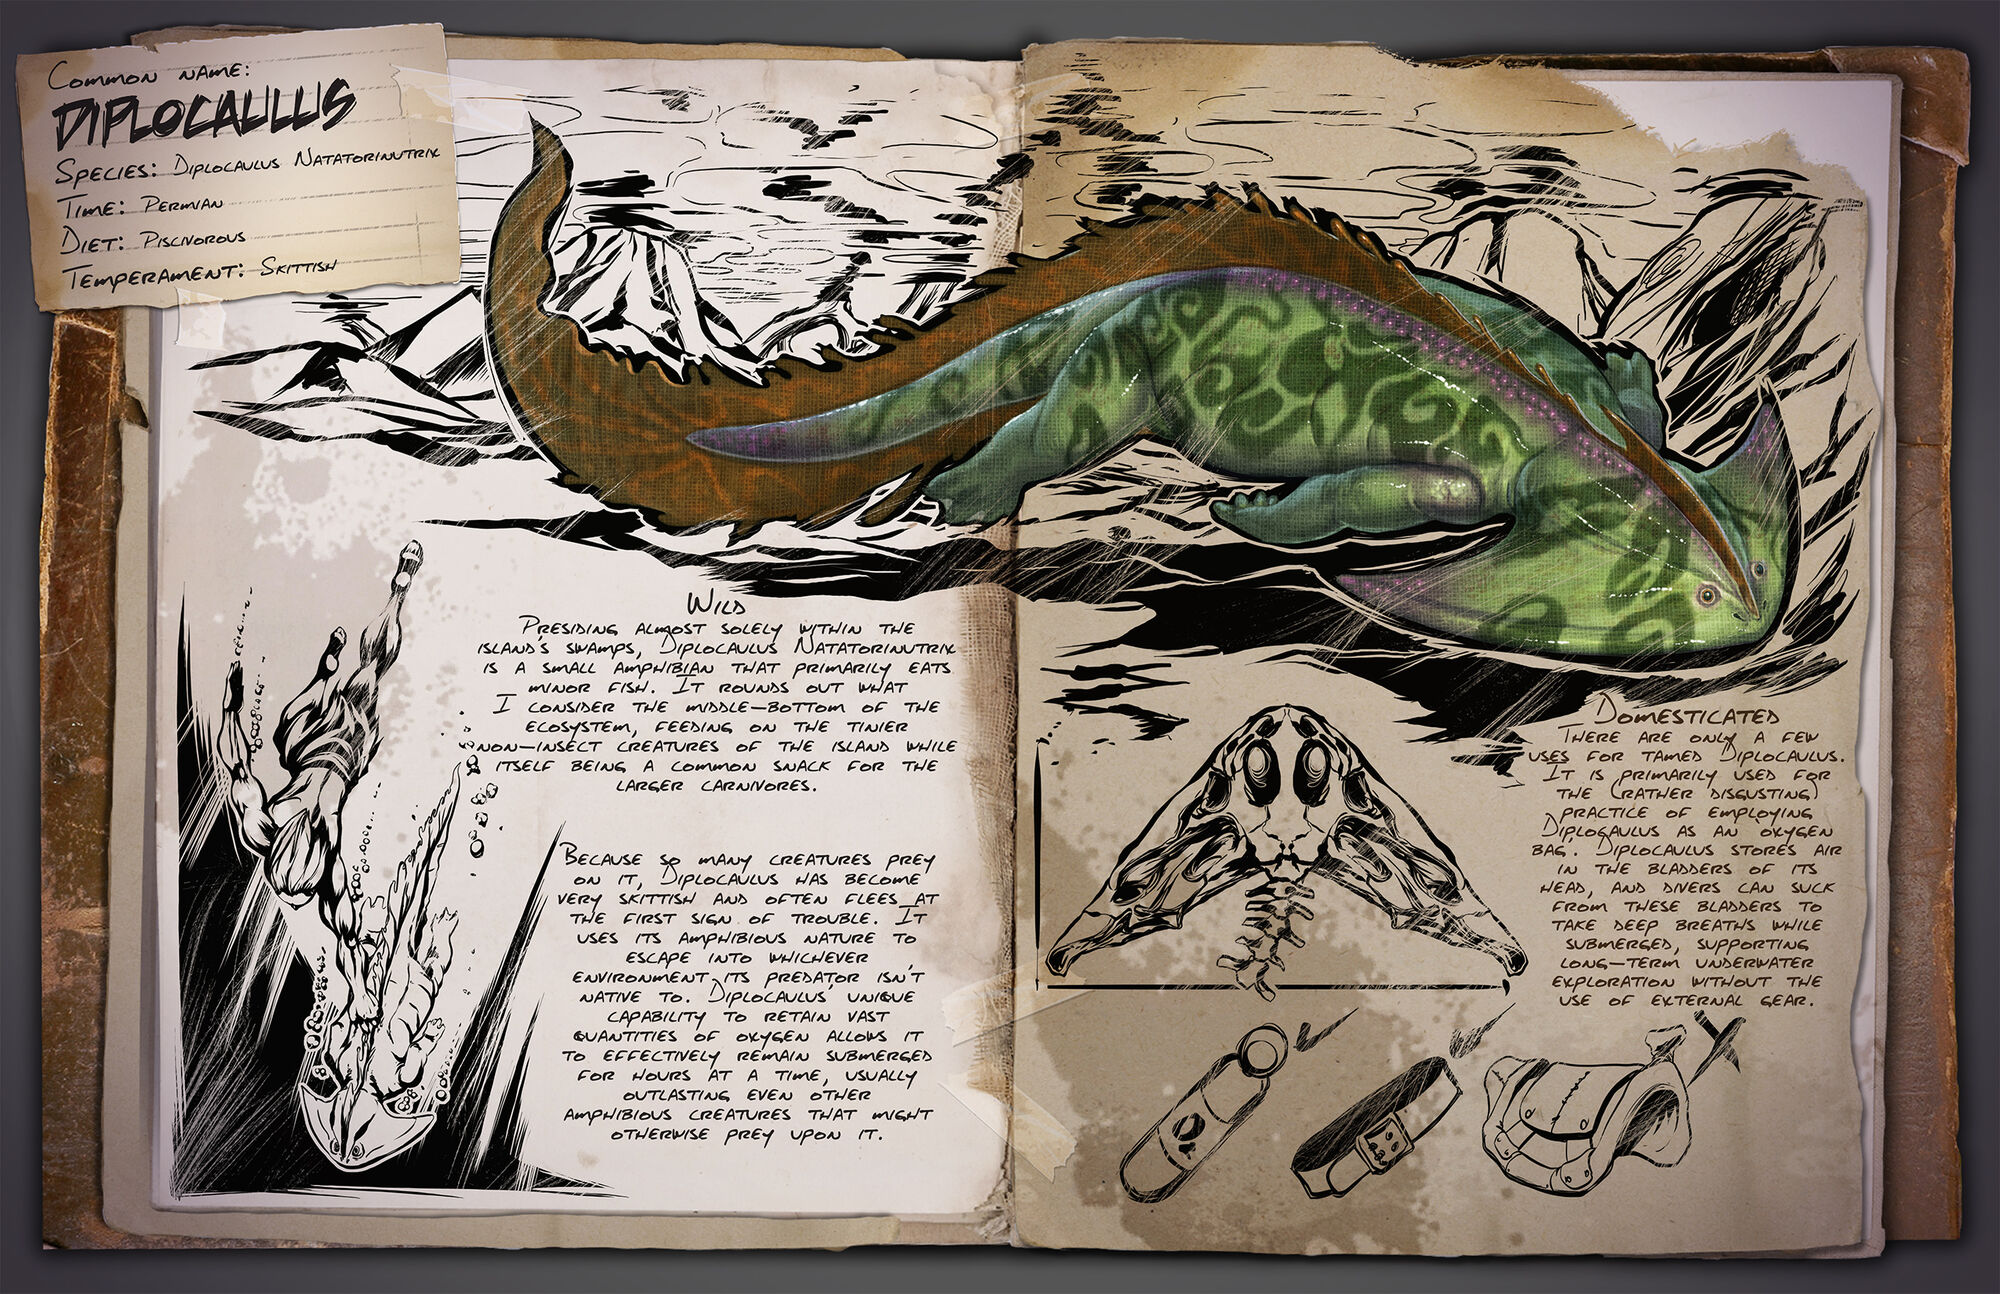 Diplocaulus | ARK: Survival Evolved Wiki | FANDOM powered by Wikia